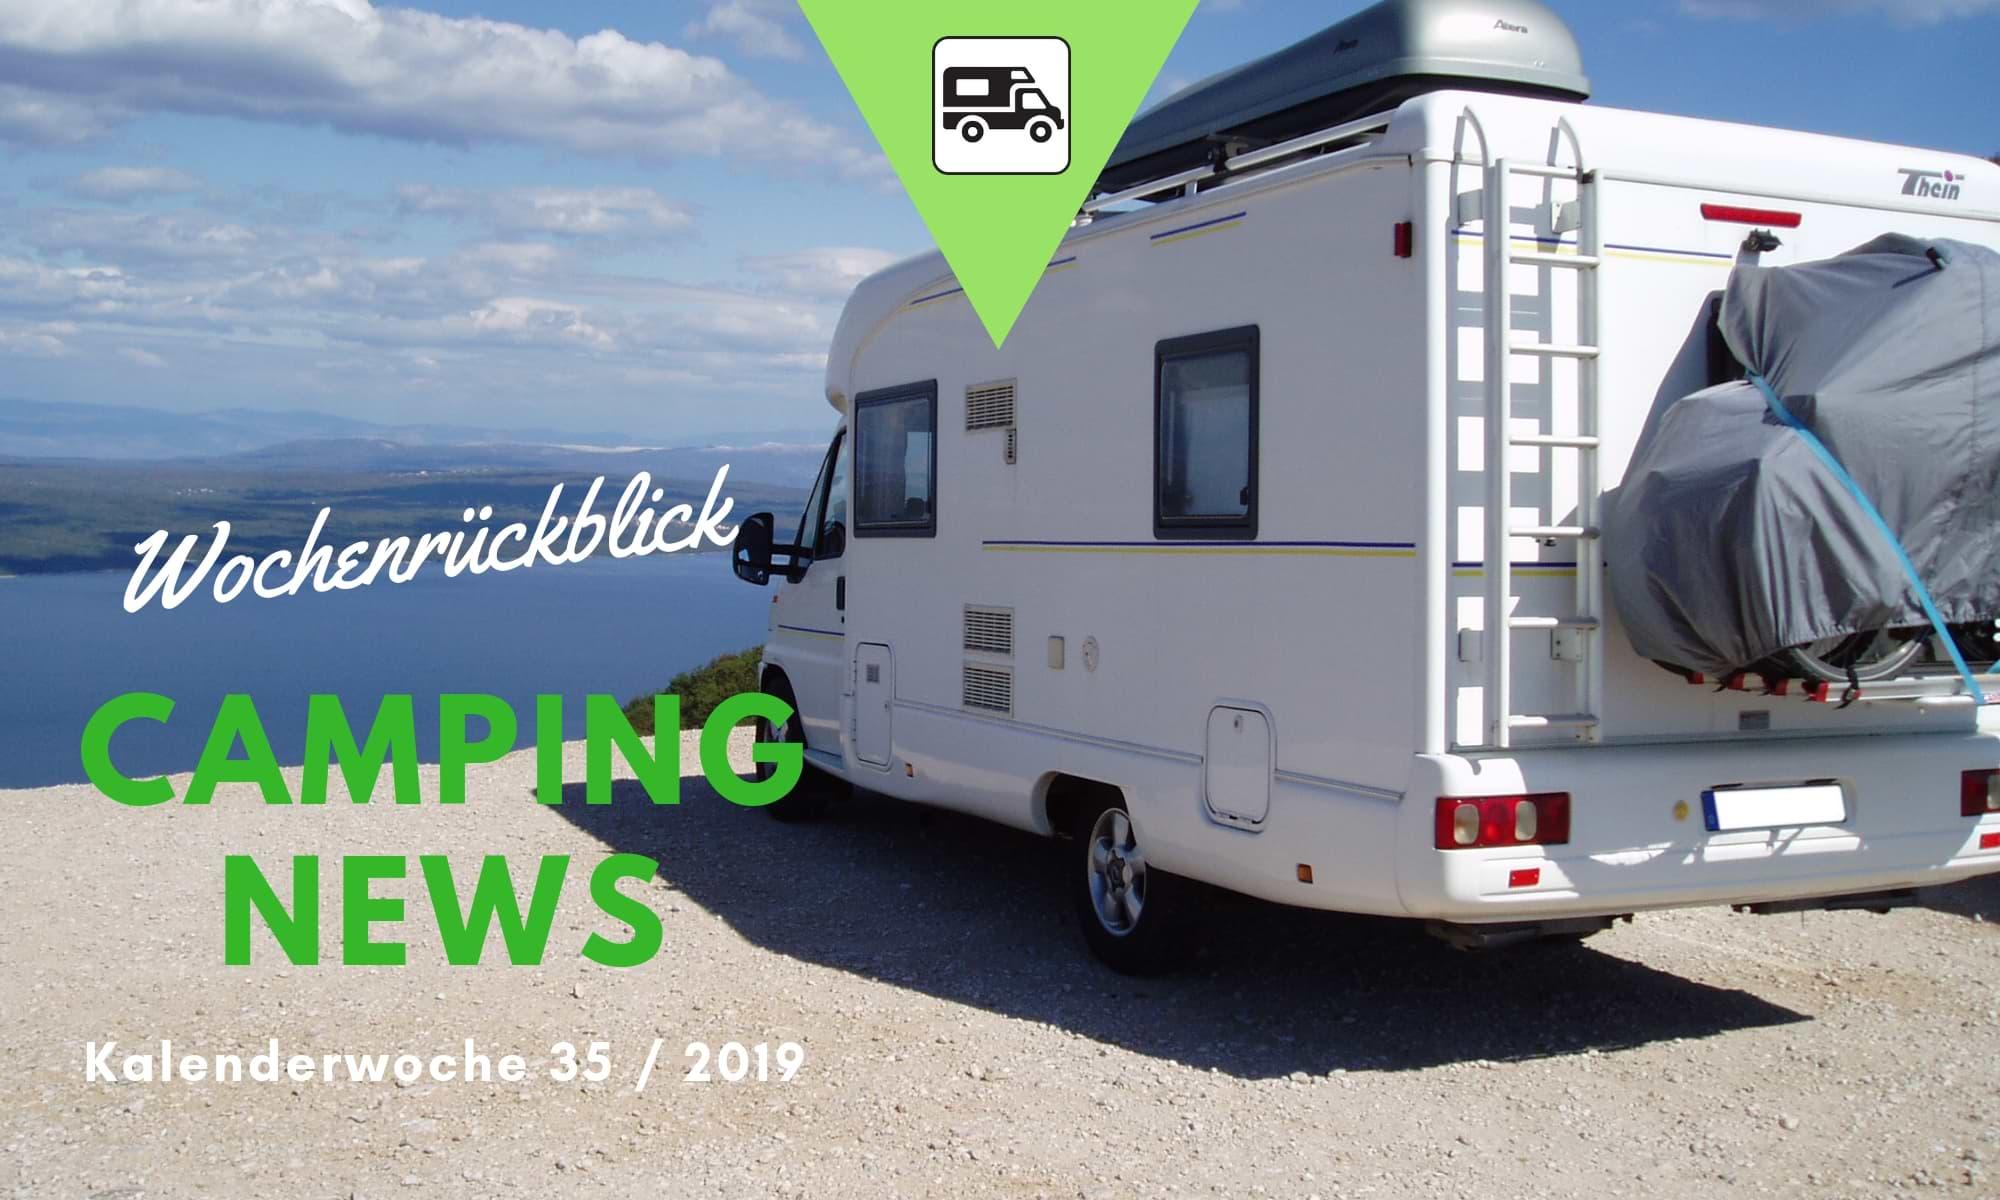 Wochenrückblick Camping News KW35-2019